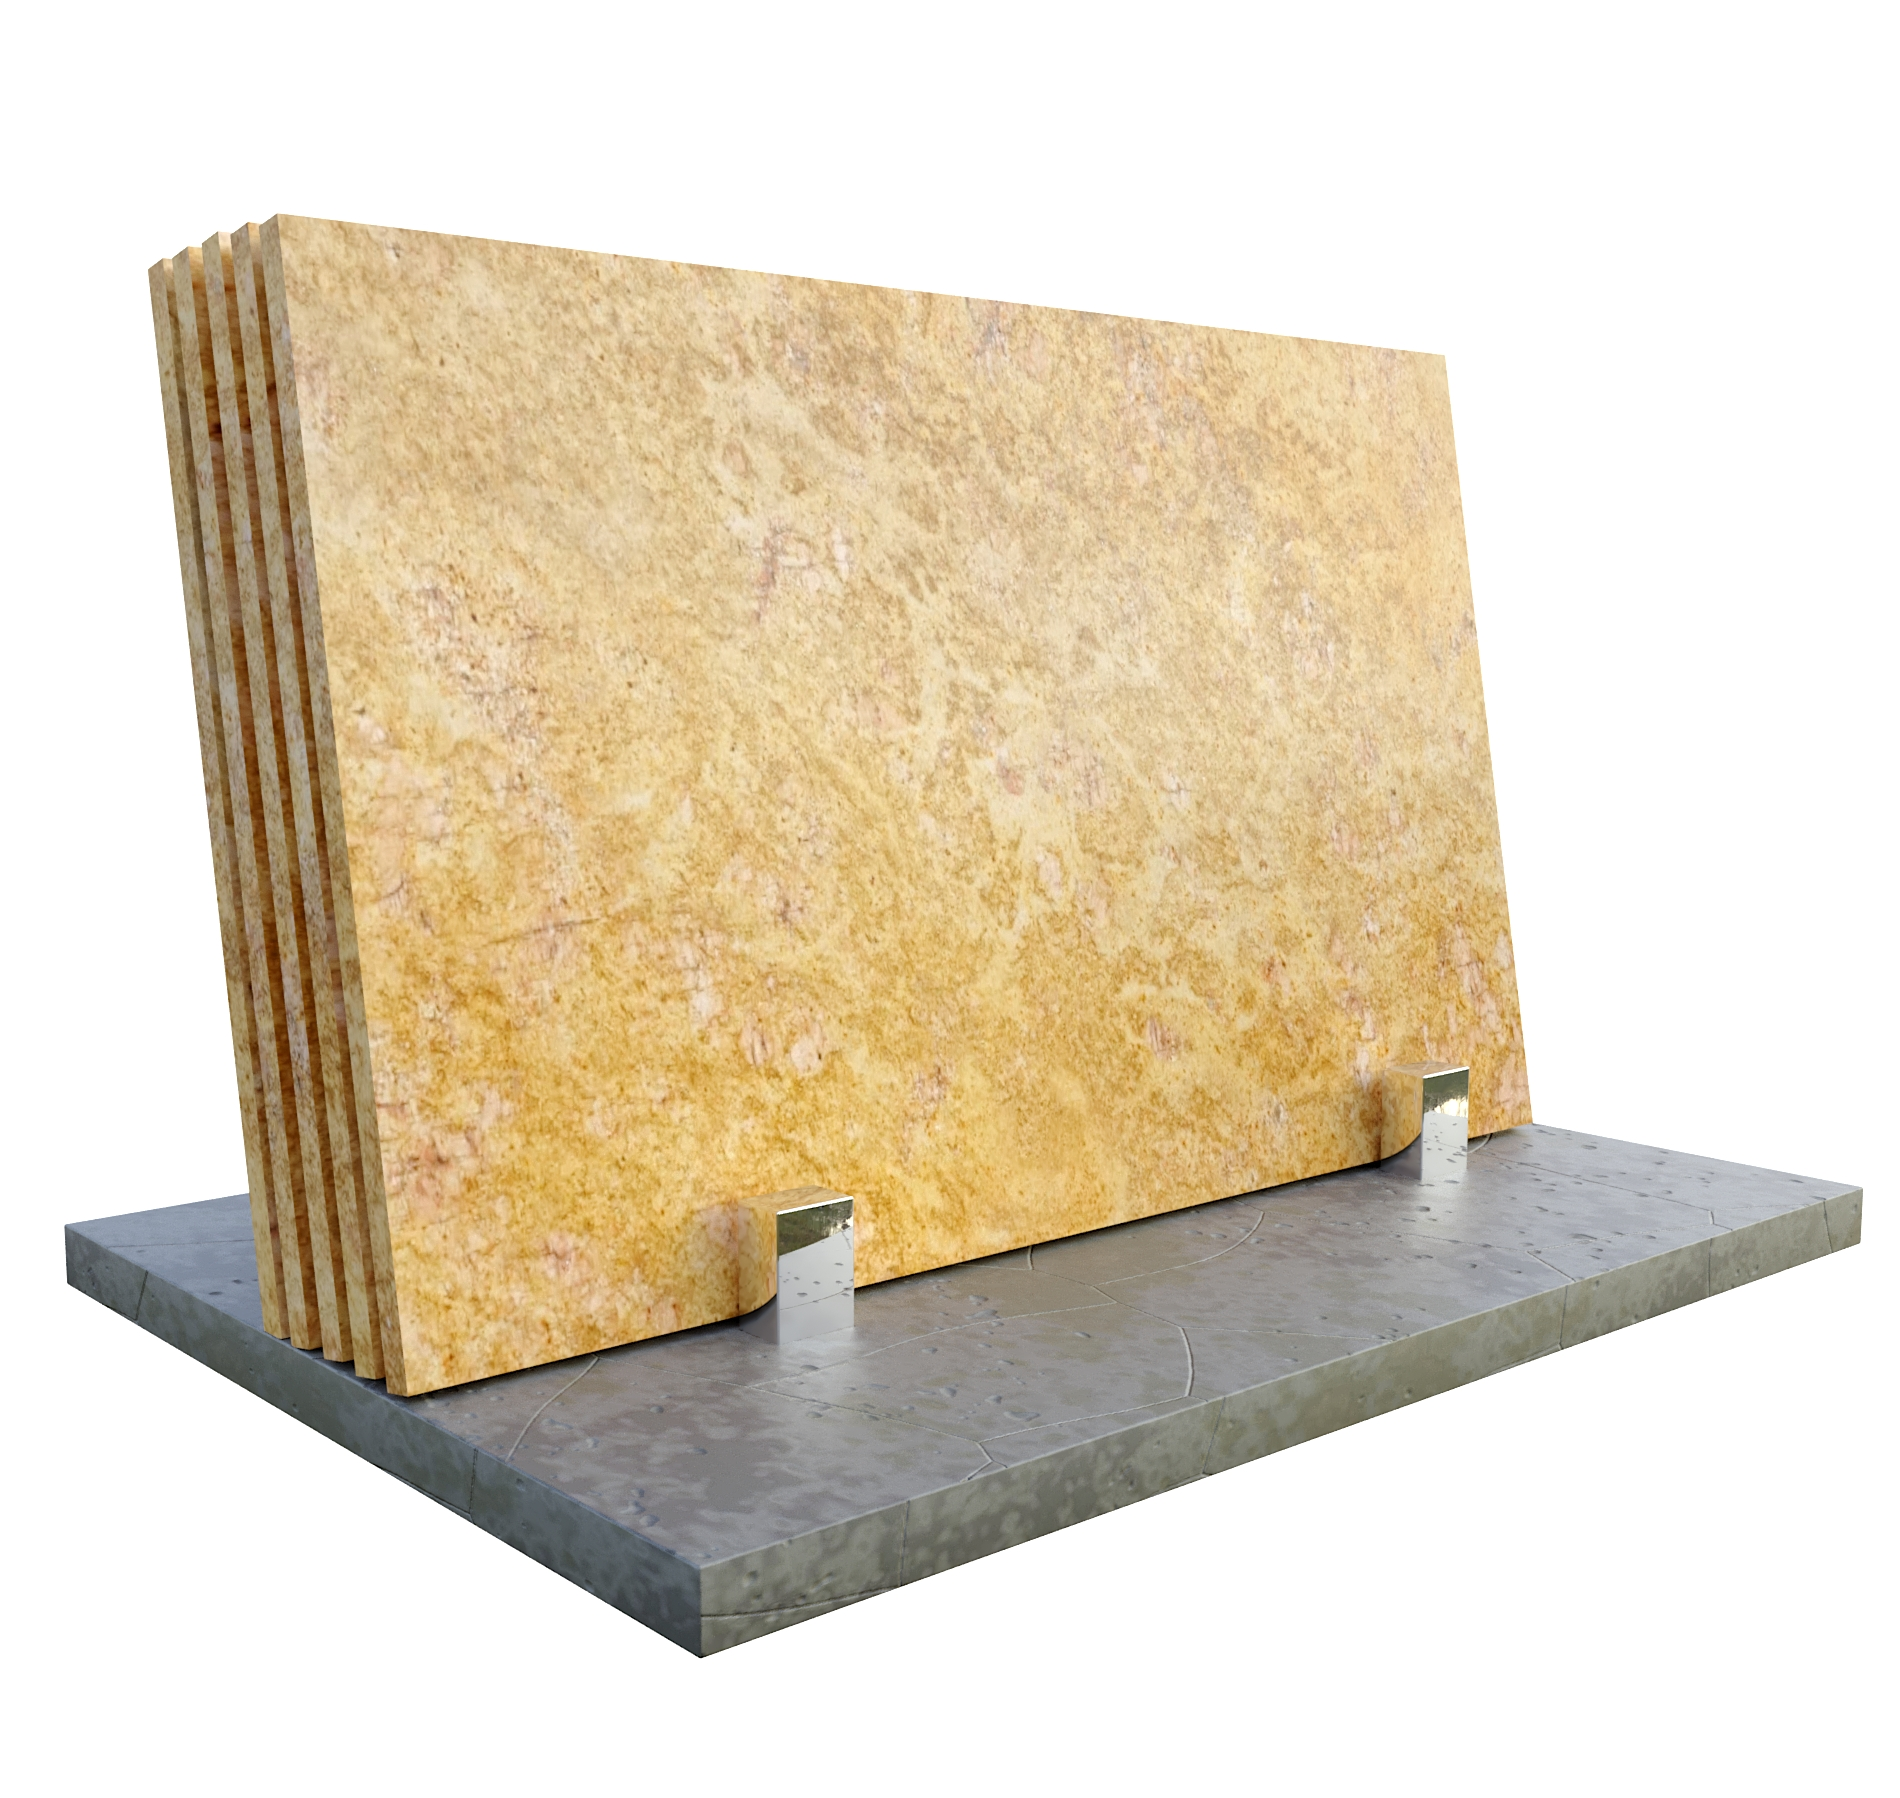 Ogromnie IMPERIAL GOLD - PS Granit - Hurtownia kamienia ES86